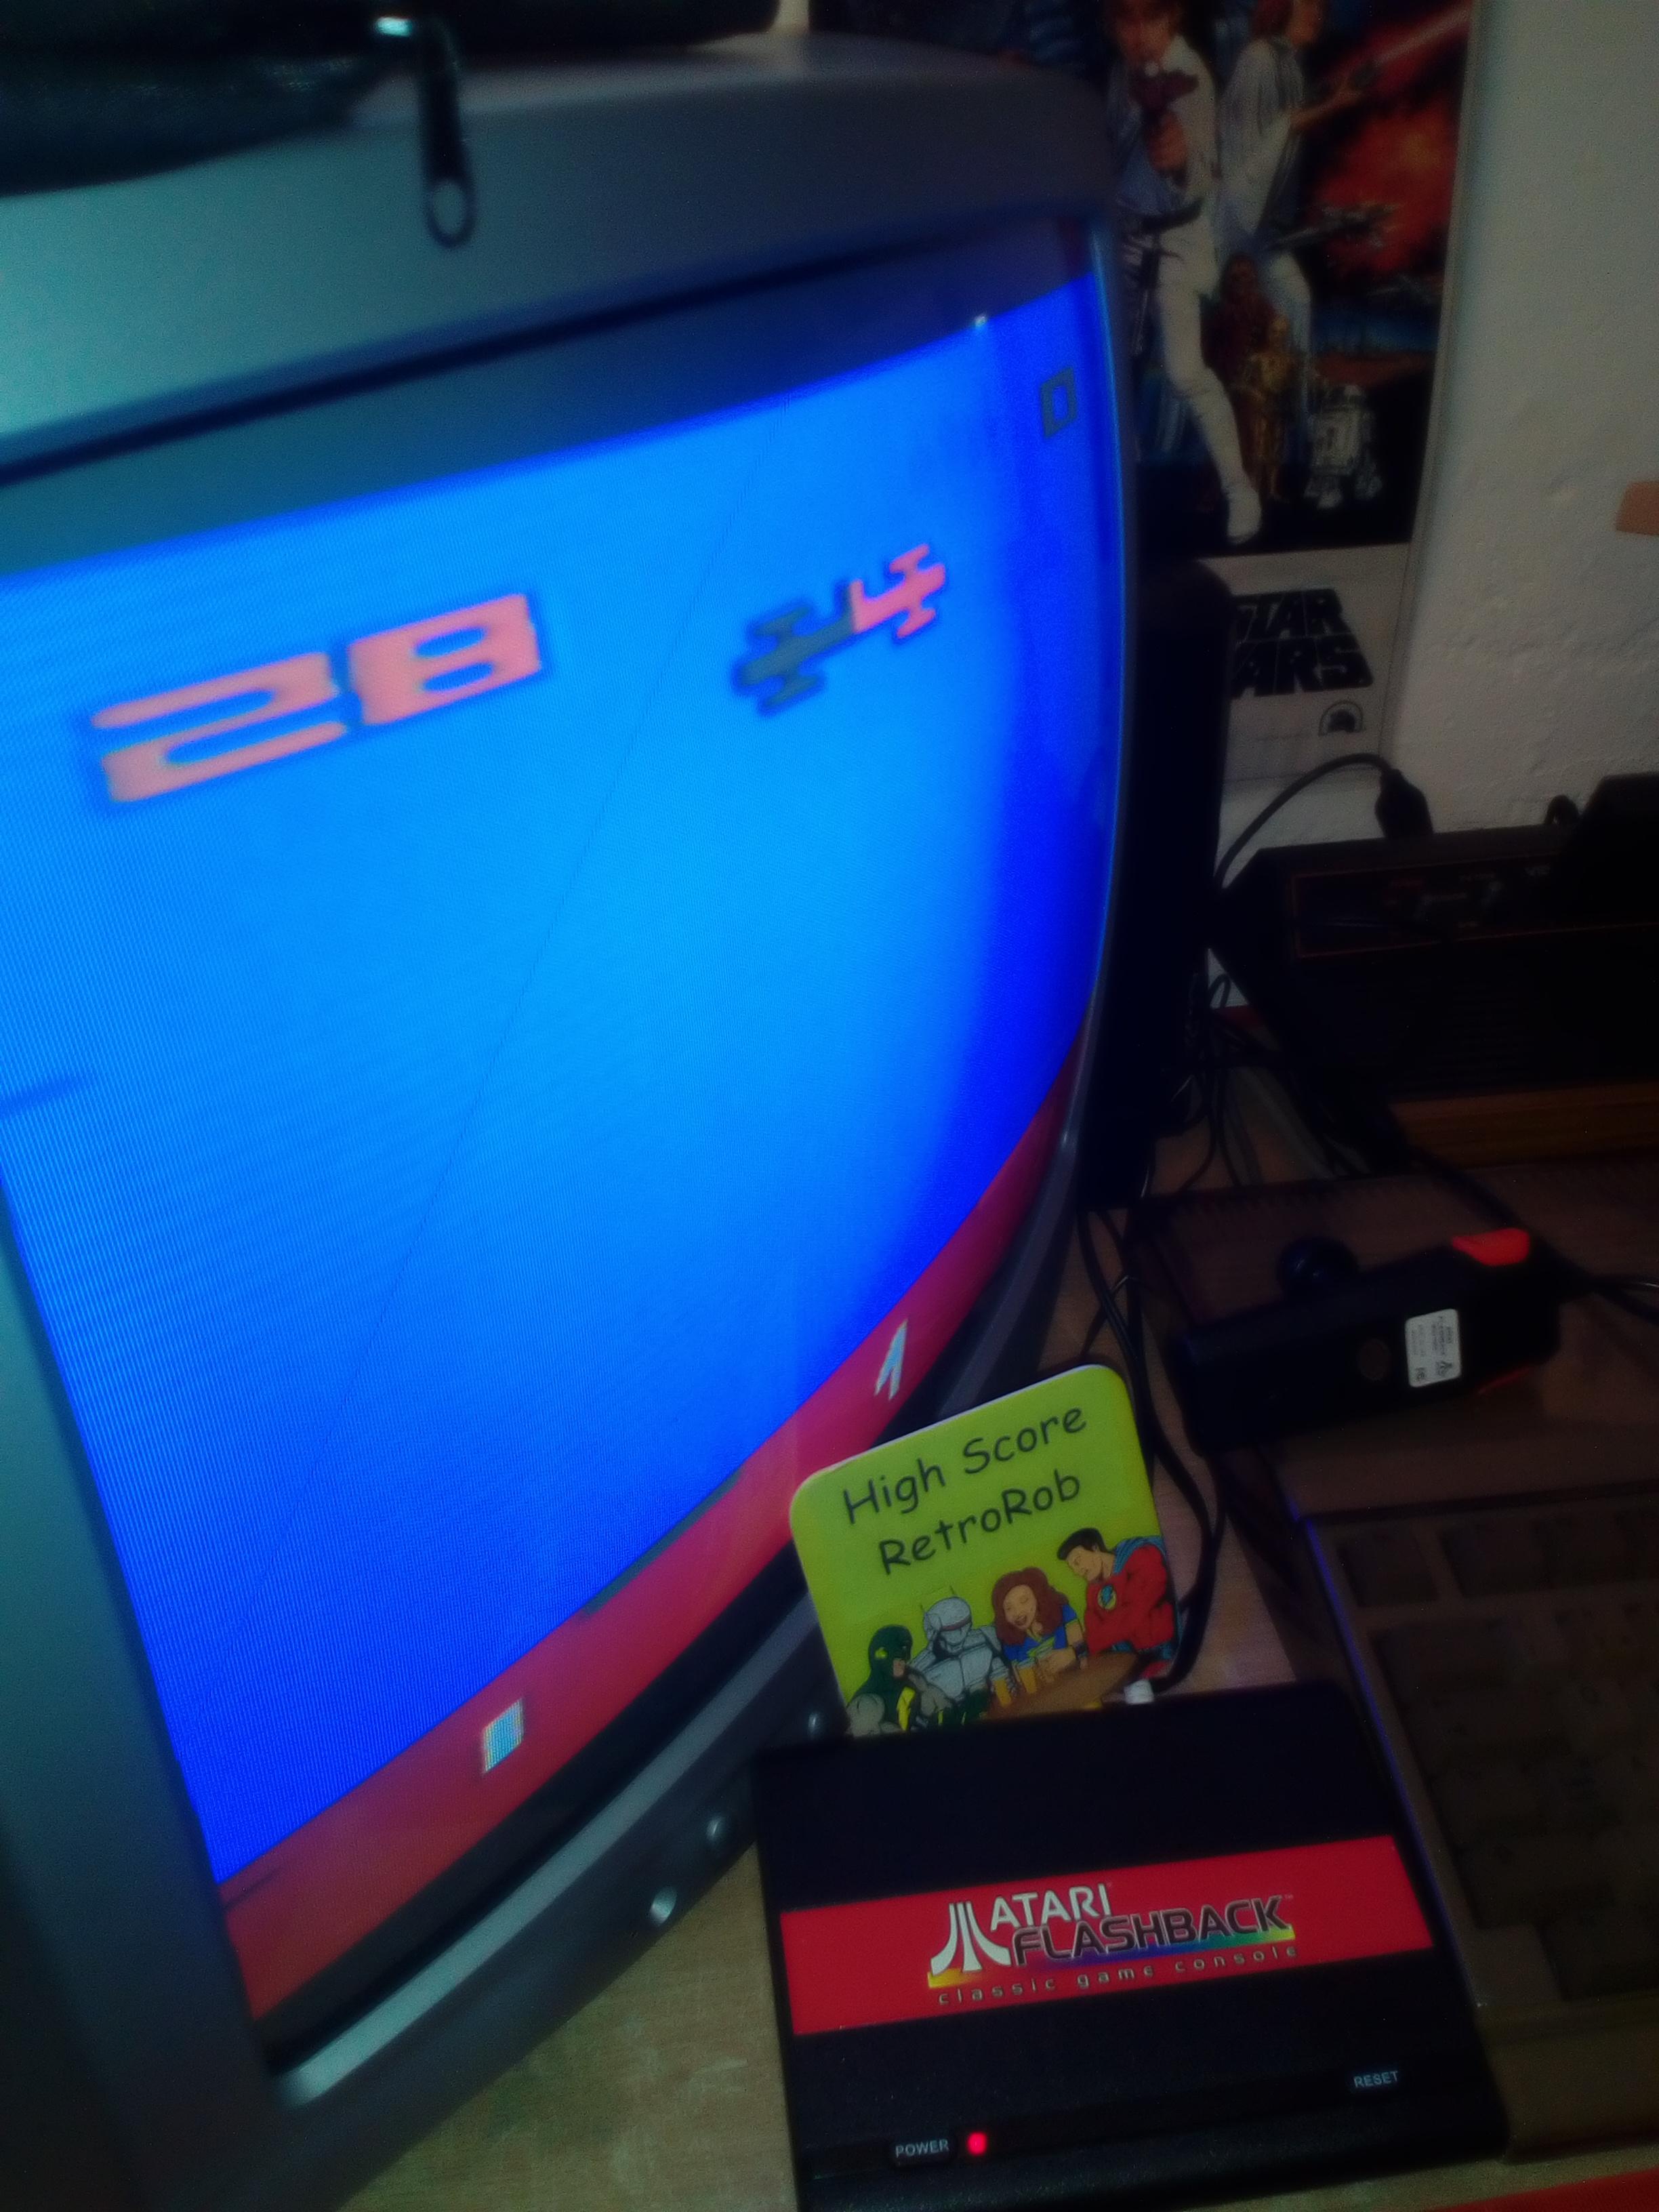 RetroRob: Sky Diver (Atari Flashback 1) 28 points on 2018-08-25 09:37:45